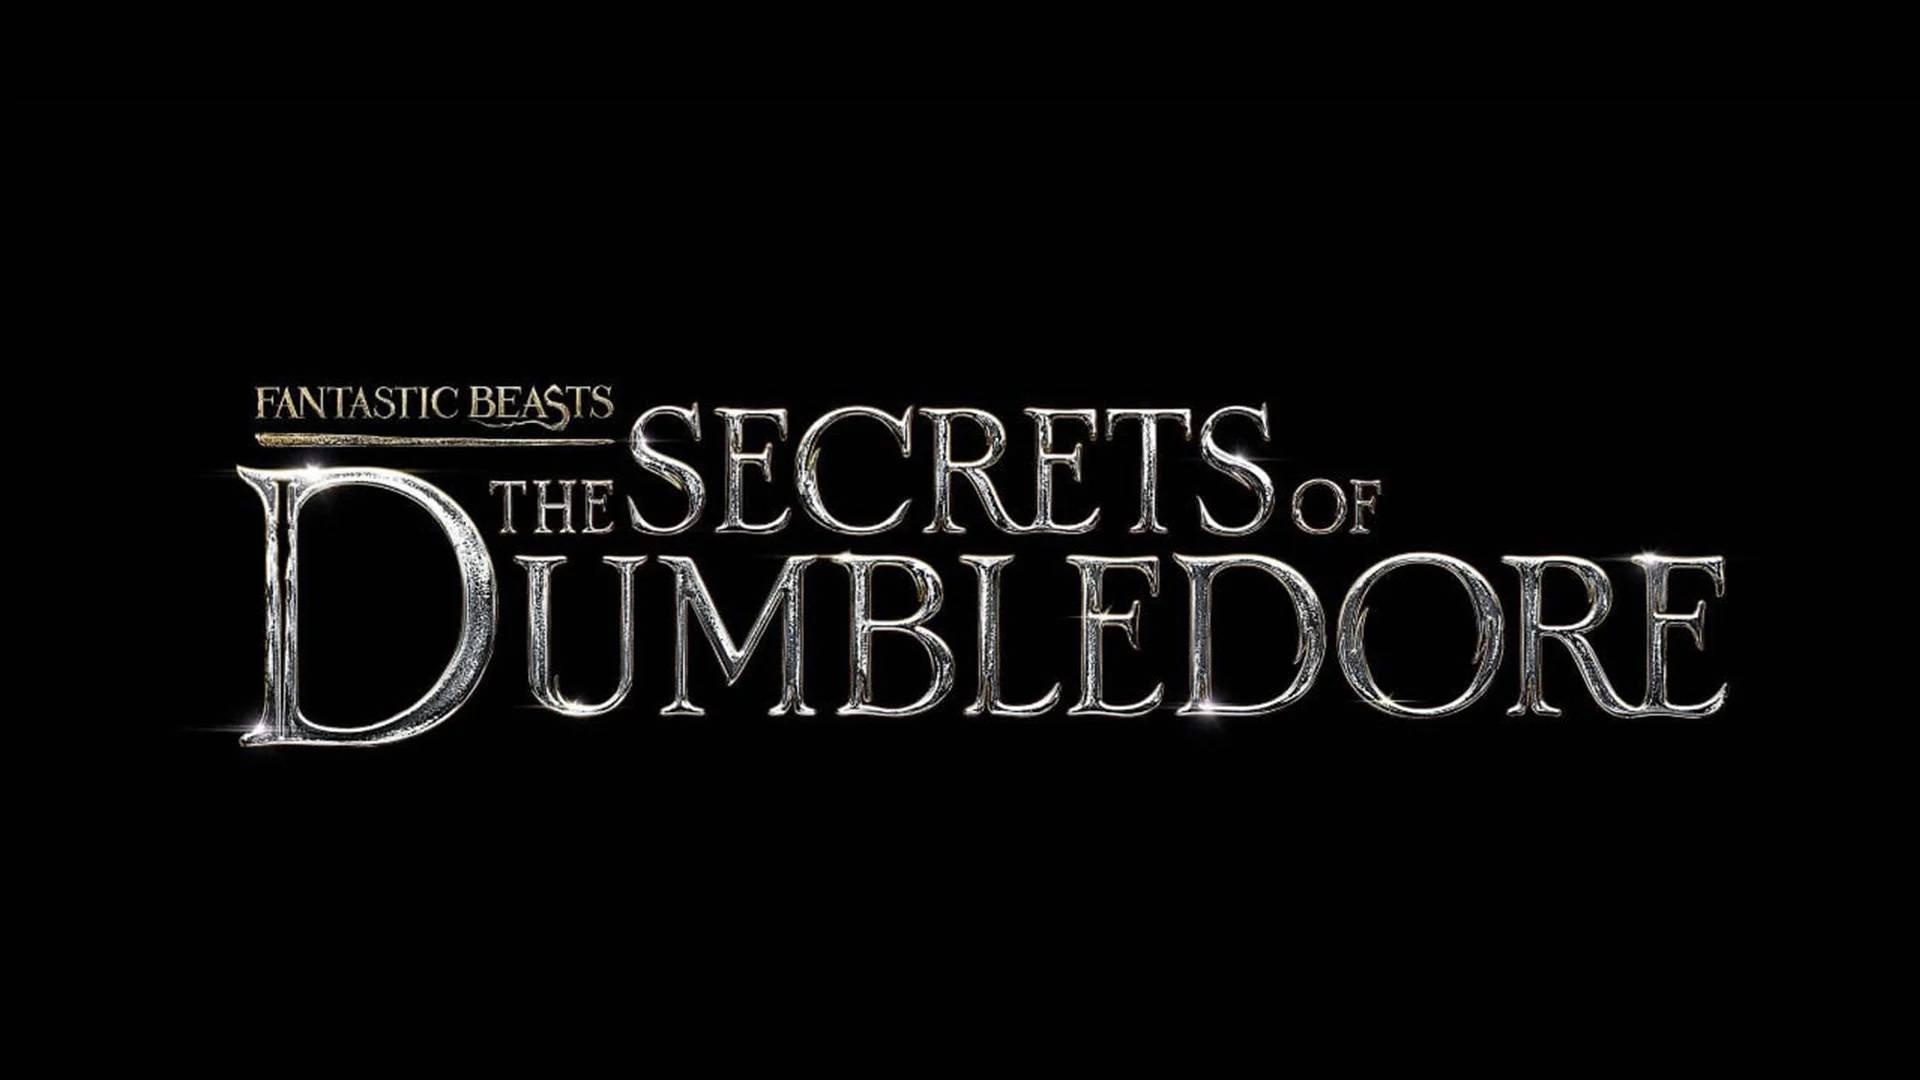 فیلم Fantastic Beasts 3